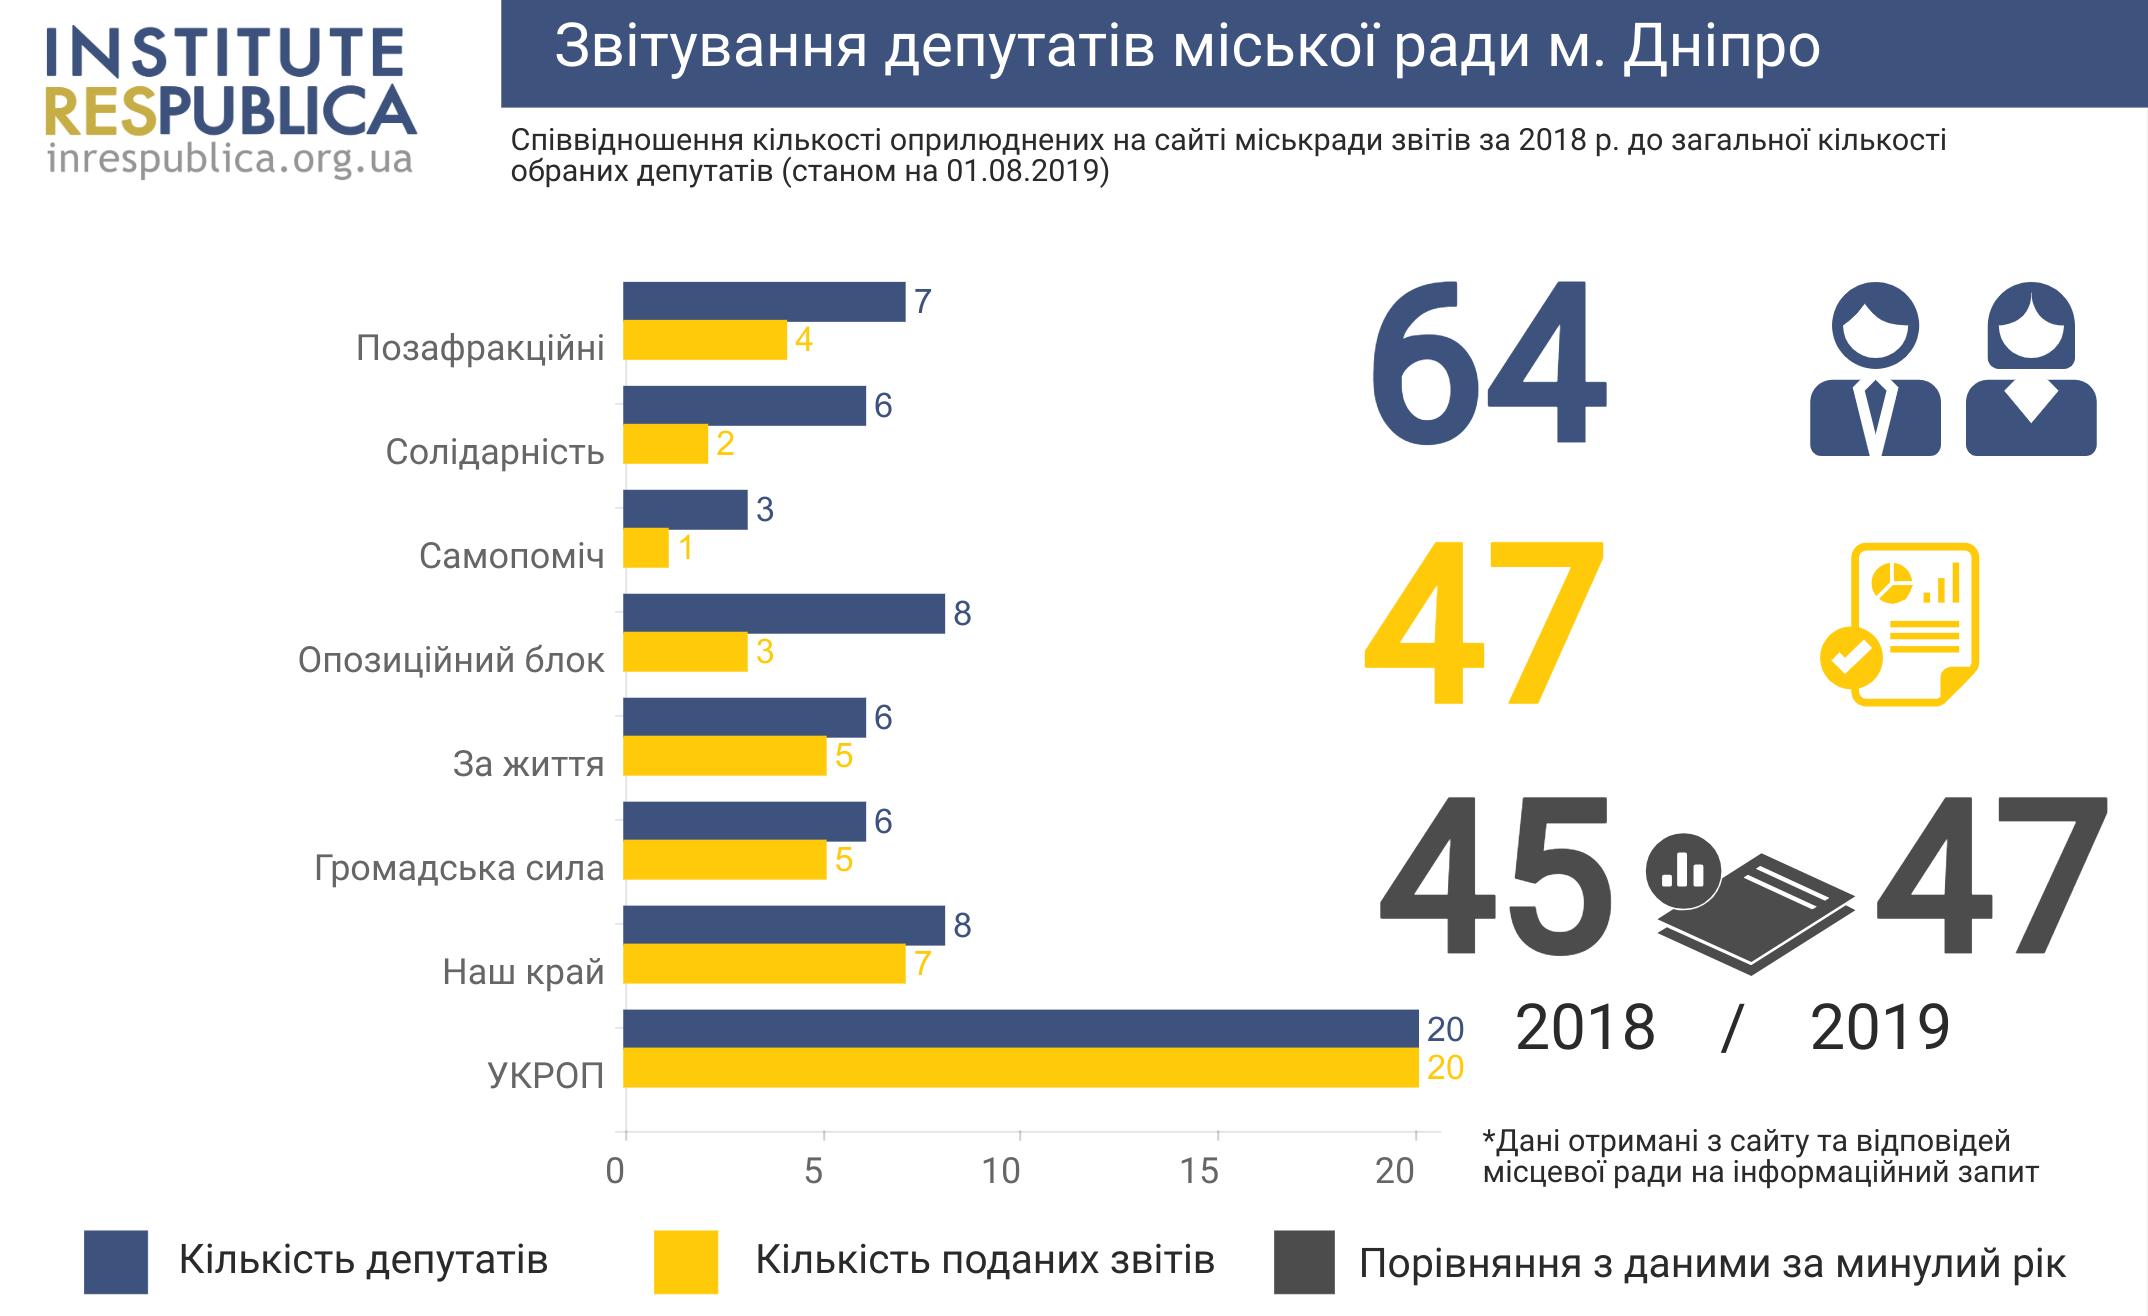 Dnipro deputy report (1)